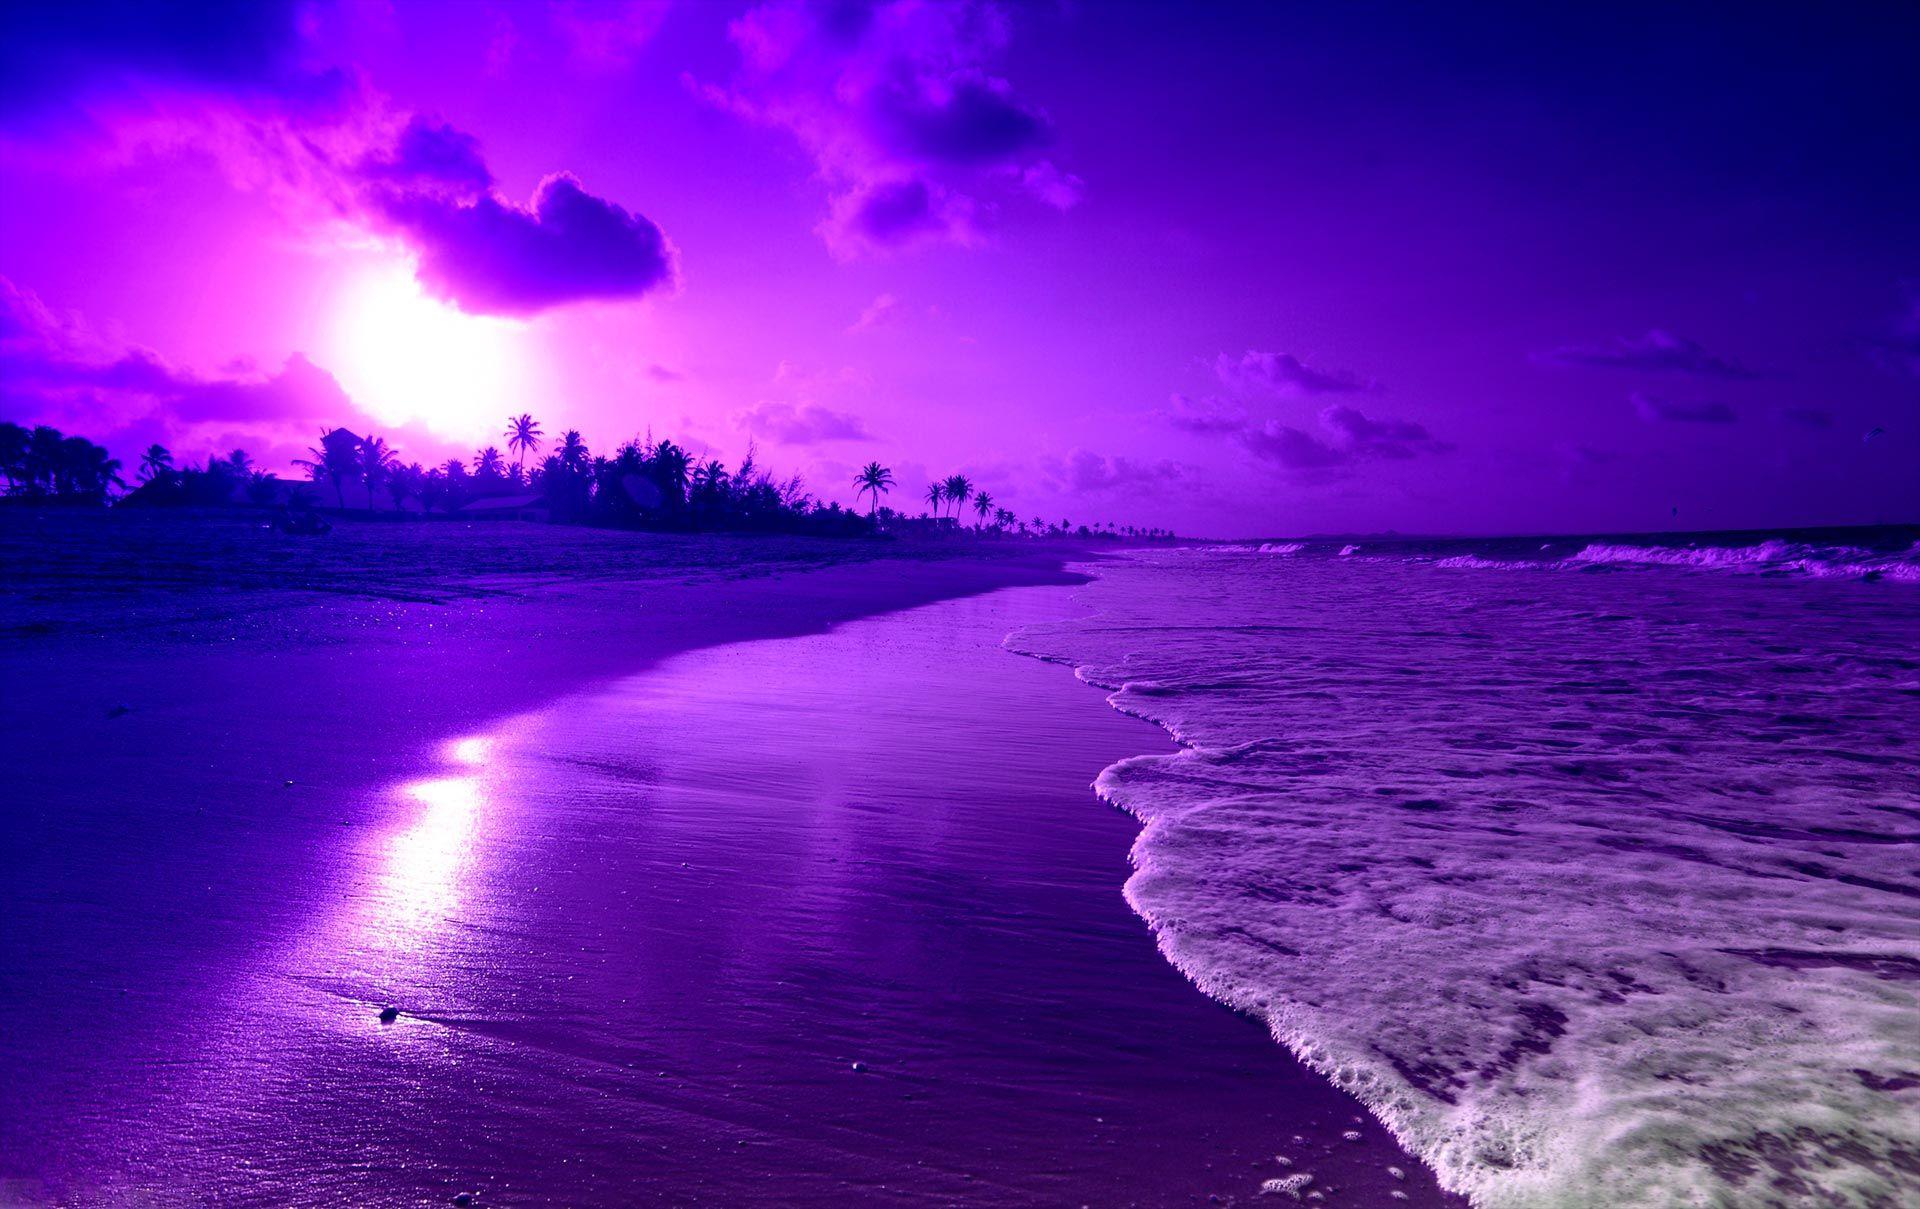 Fondo pantalla paisaje bonito anochecer playa libro en for Imagenes de fondos bonitos